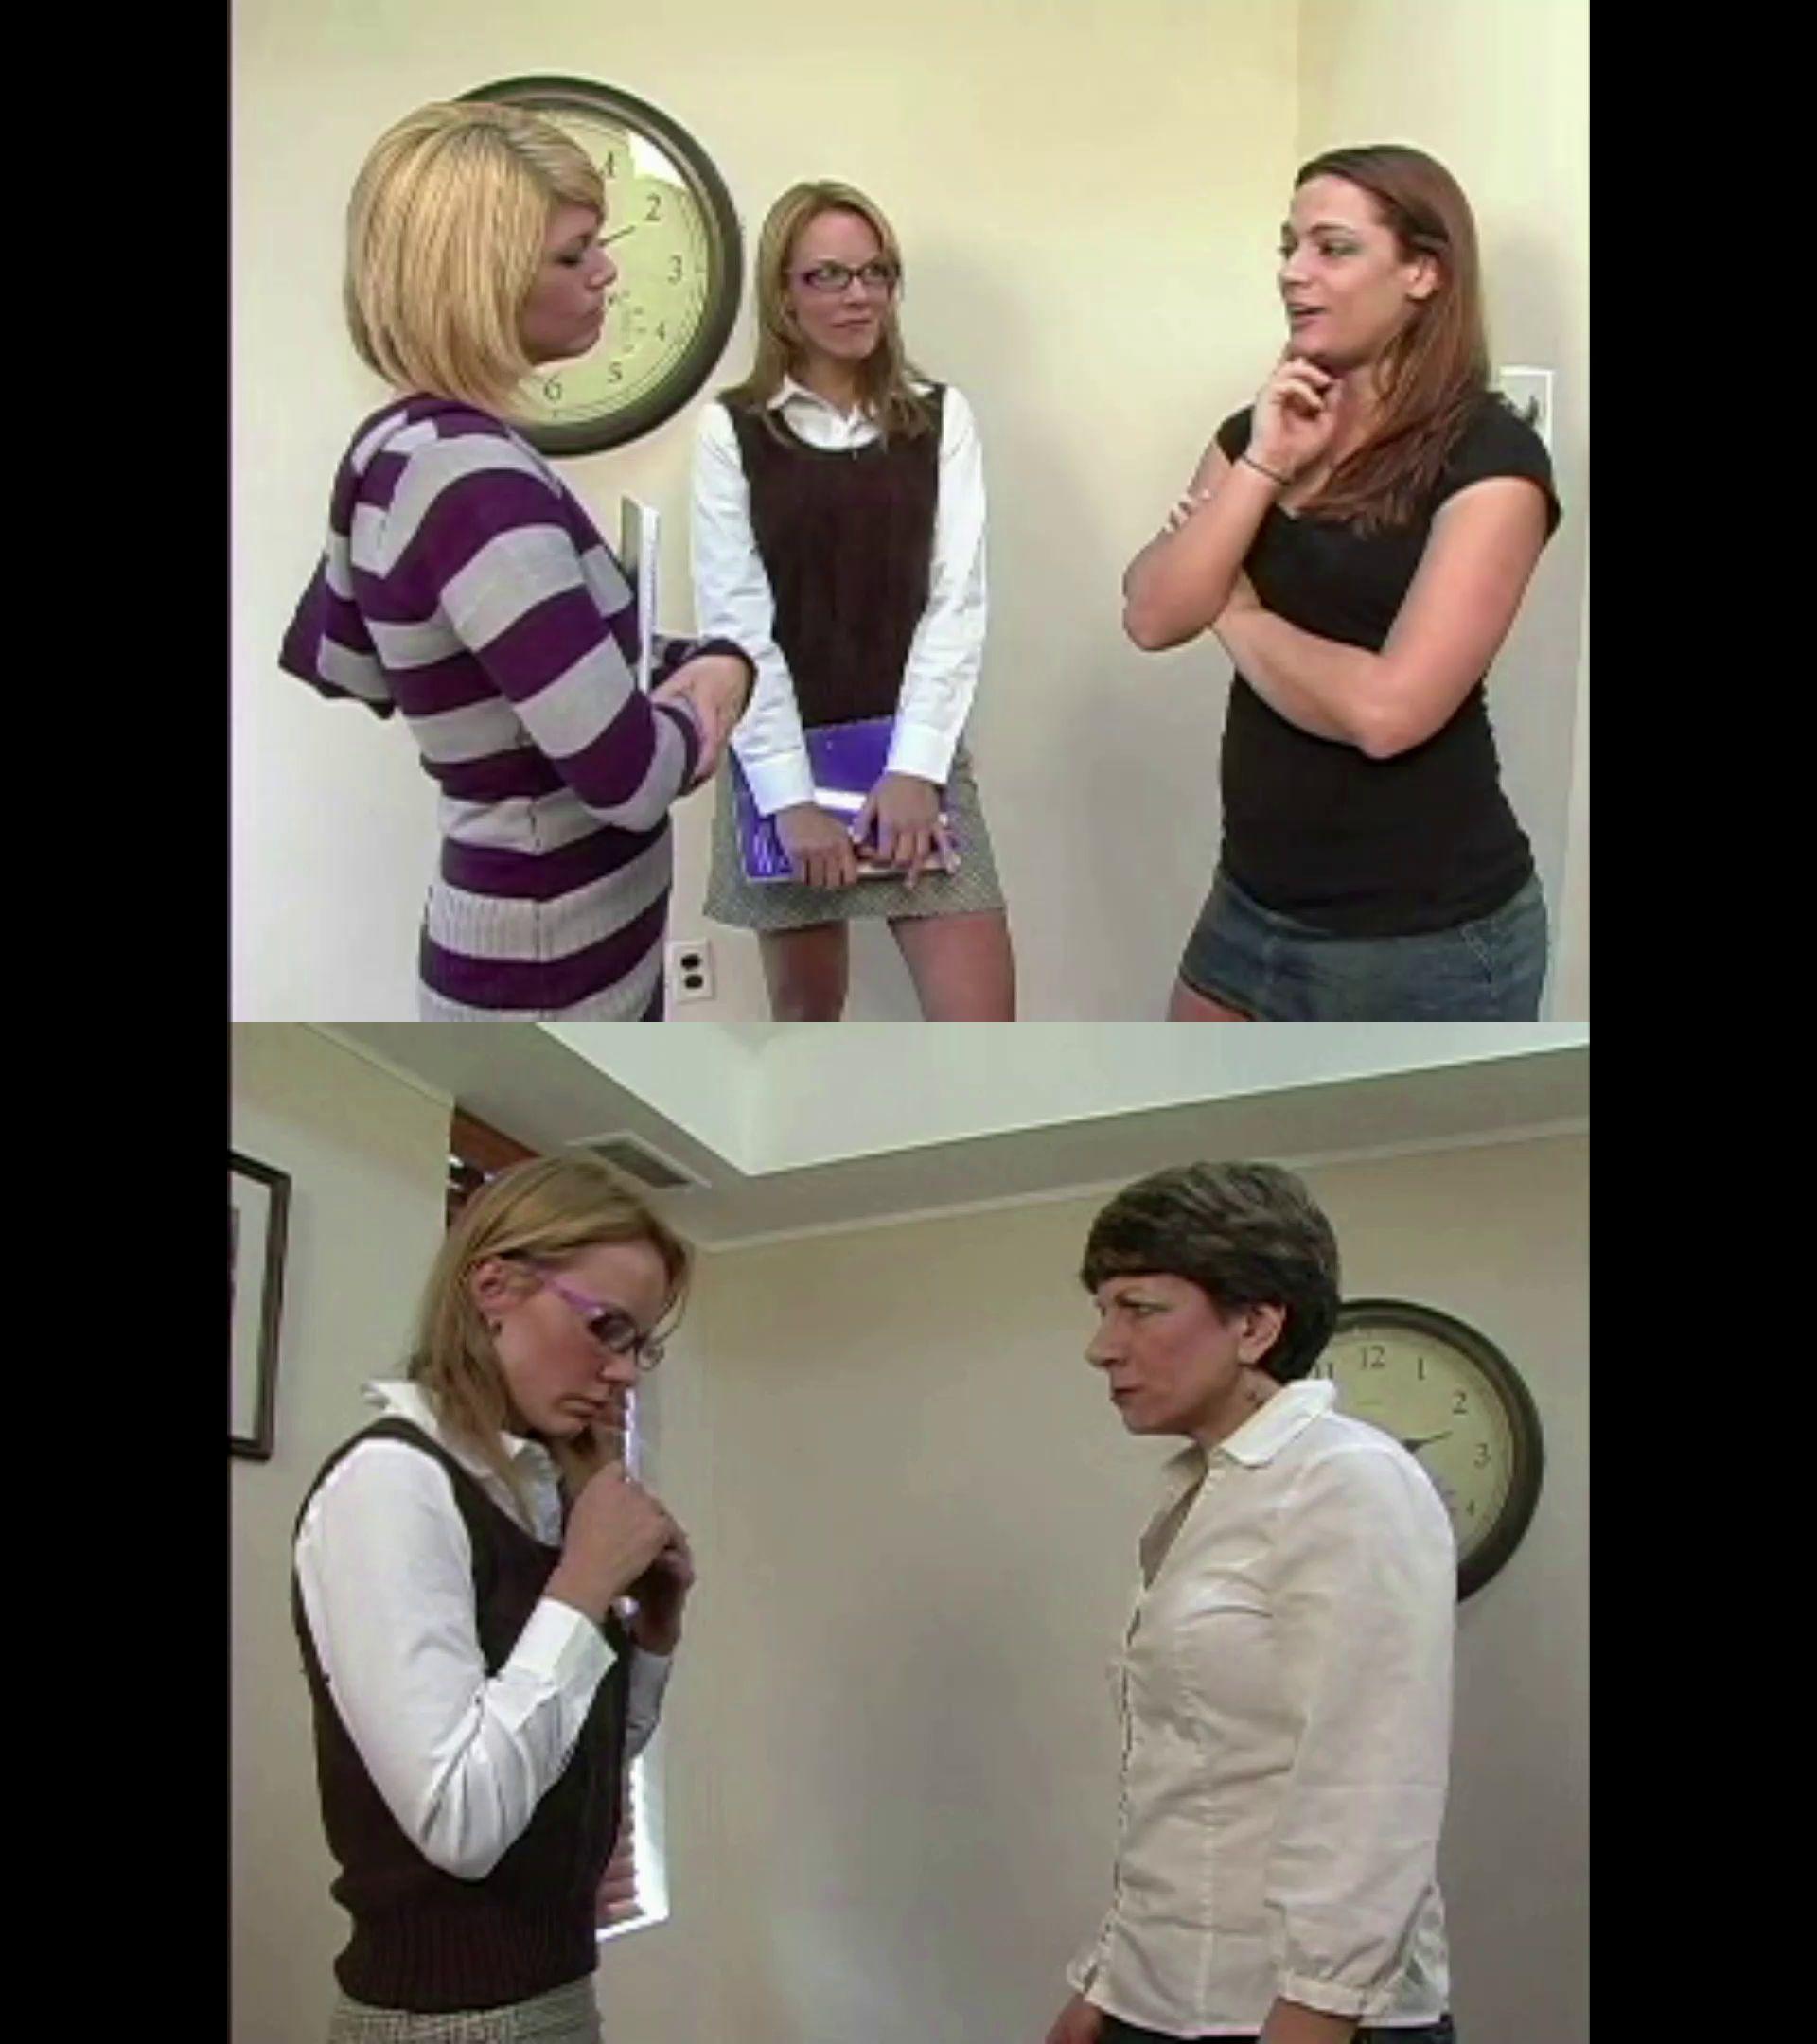 Punished Brats – MP4/Full HD – Amber Pixie Wells, Veronica Bound, Ten Amorette, Carisssa Montgomery, Cassandra, Miss Susan – Pixie Triple Feture